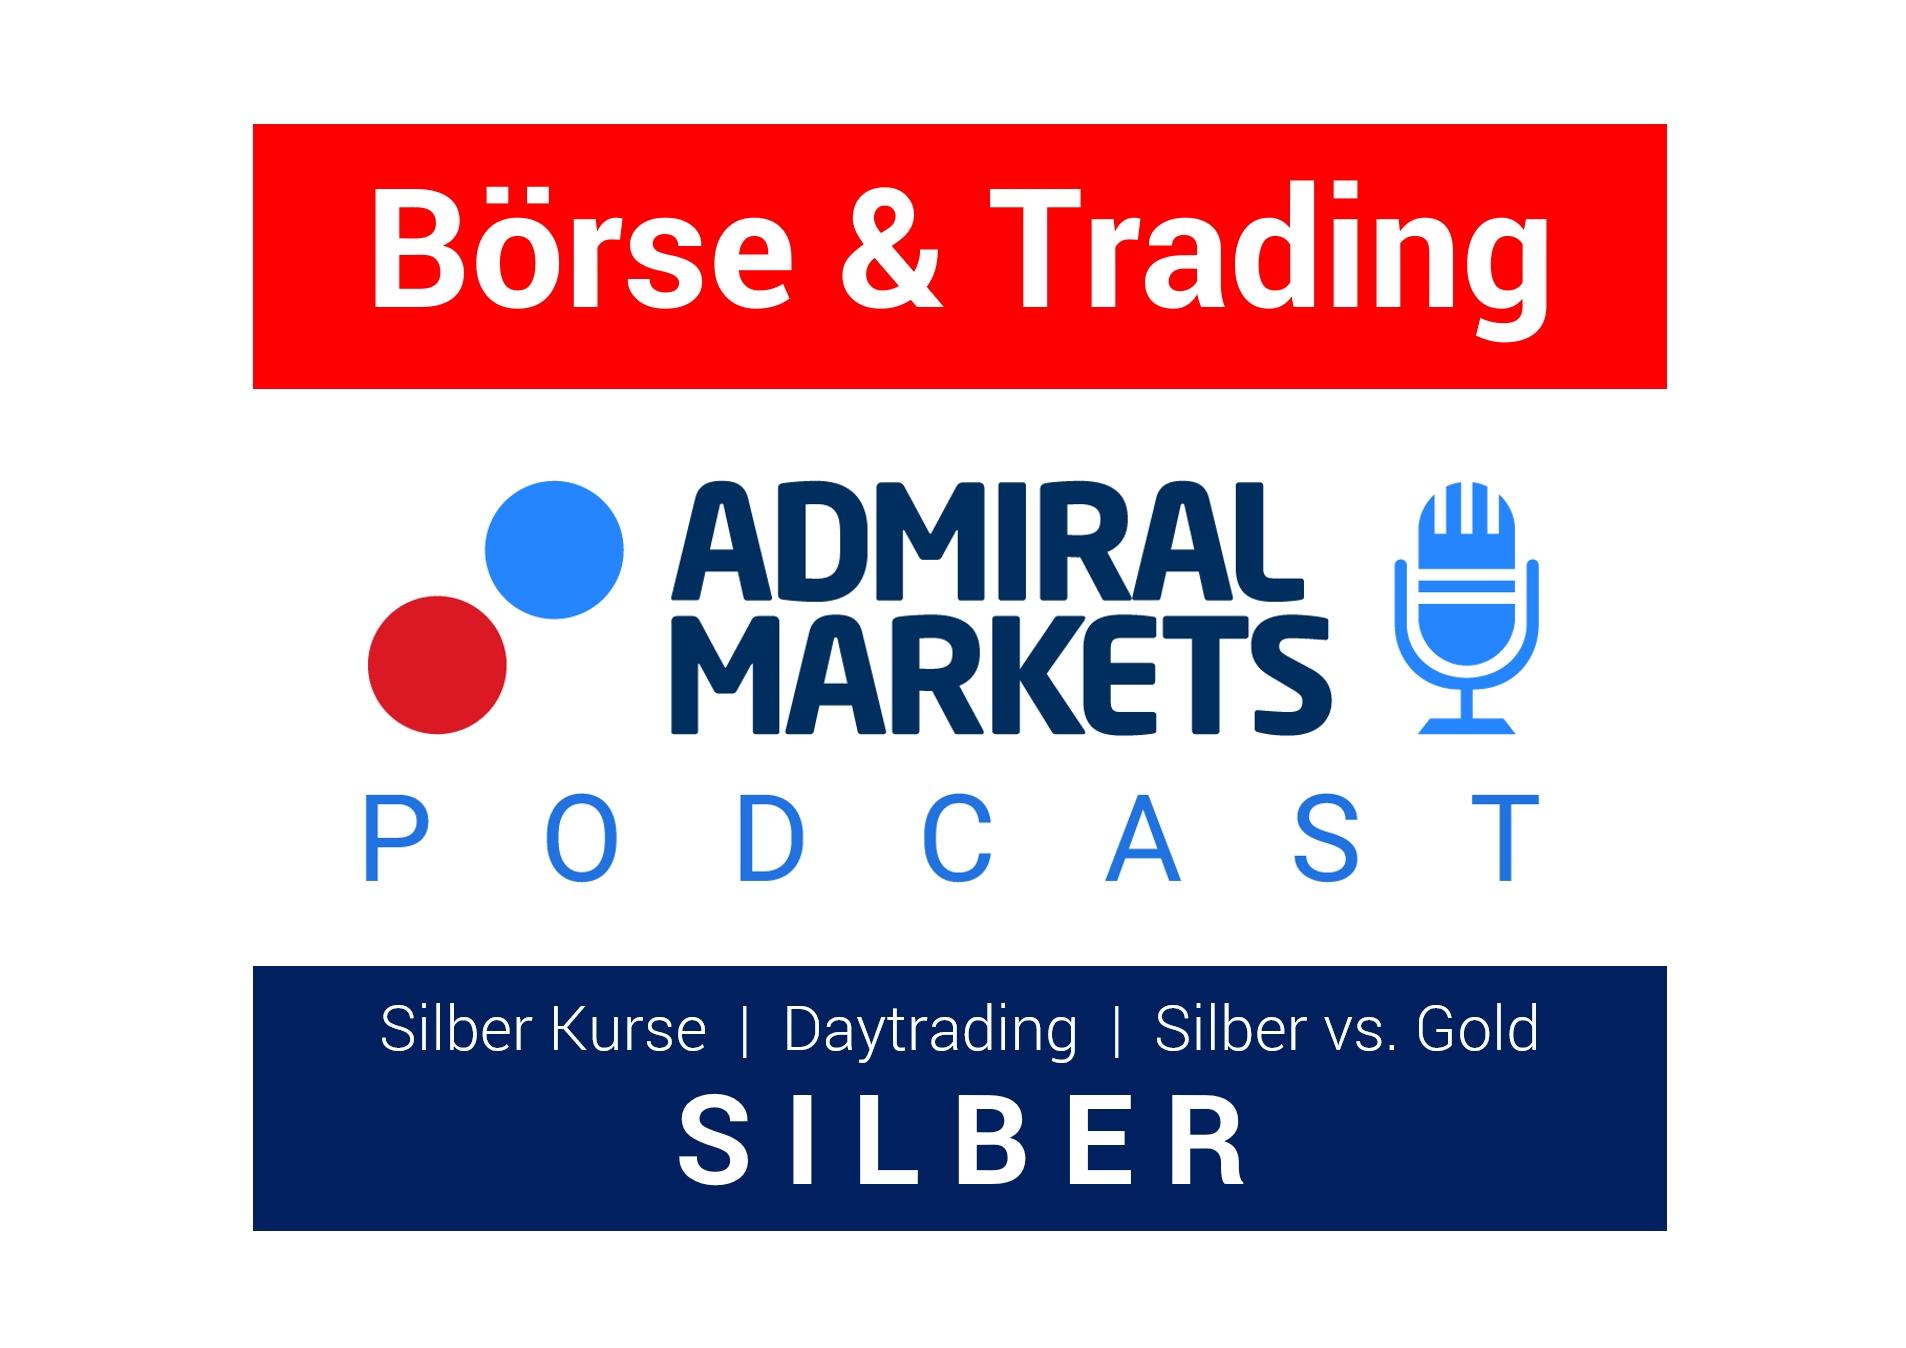 Podcast-SILBER-Silber-vs-Gold-Silber-Daytrading-Silber-Analyse-und-Historie-Kommentar-Jens-Chrzanowski-GodmodeTrader.de-1